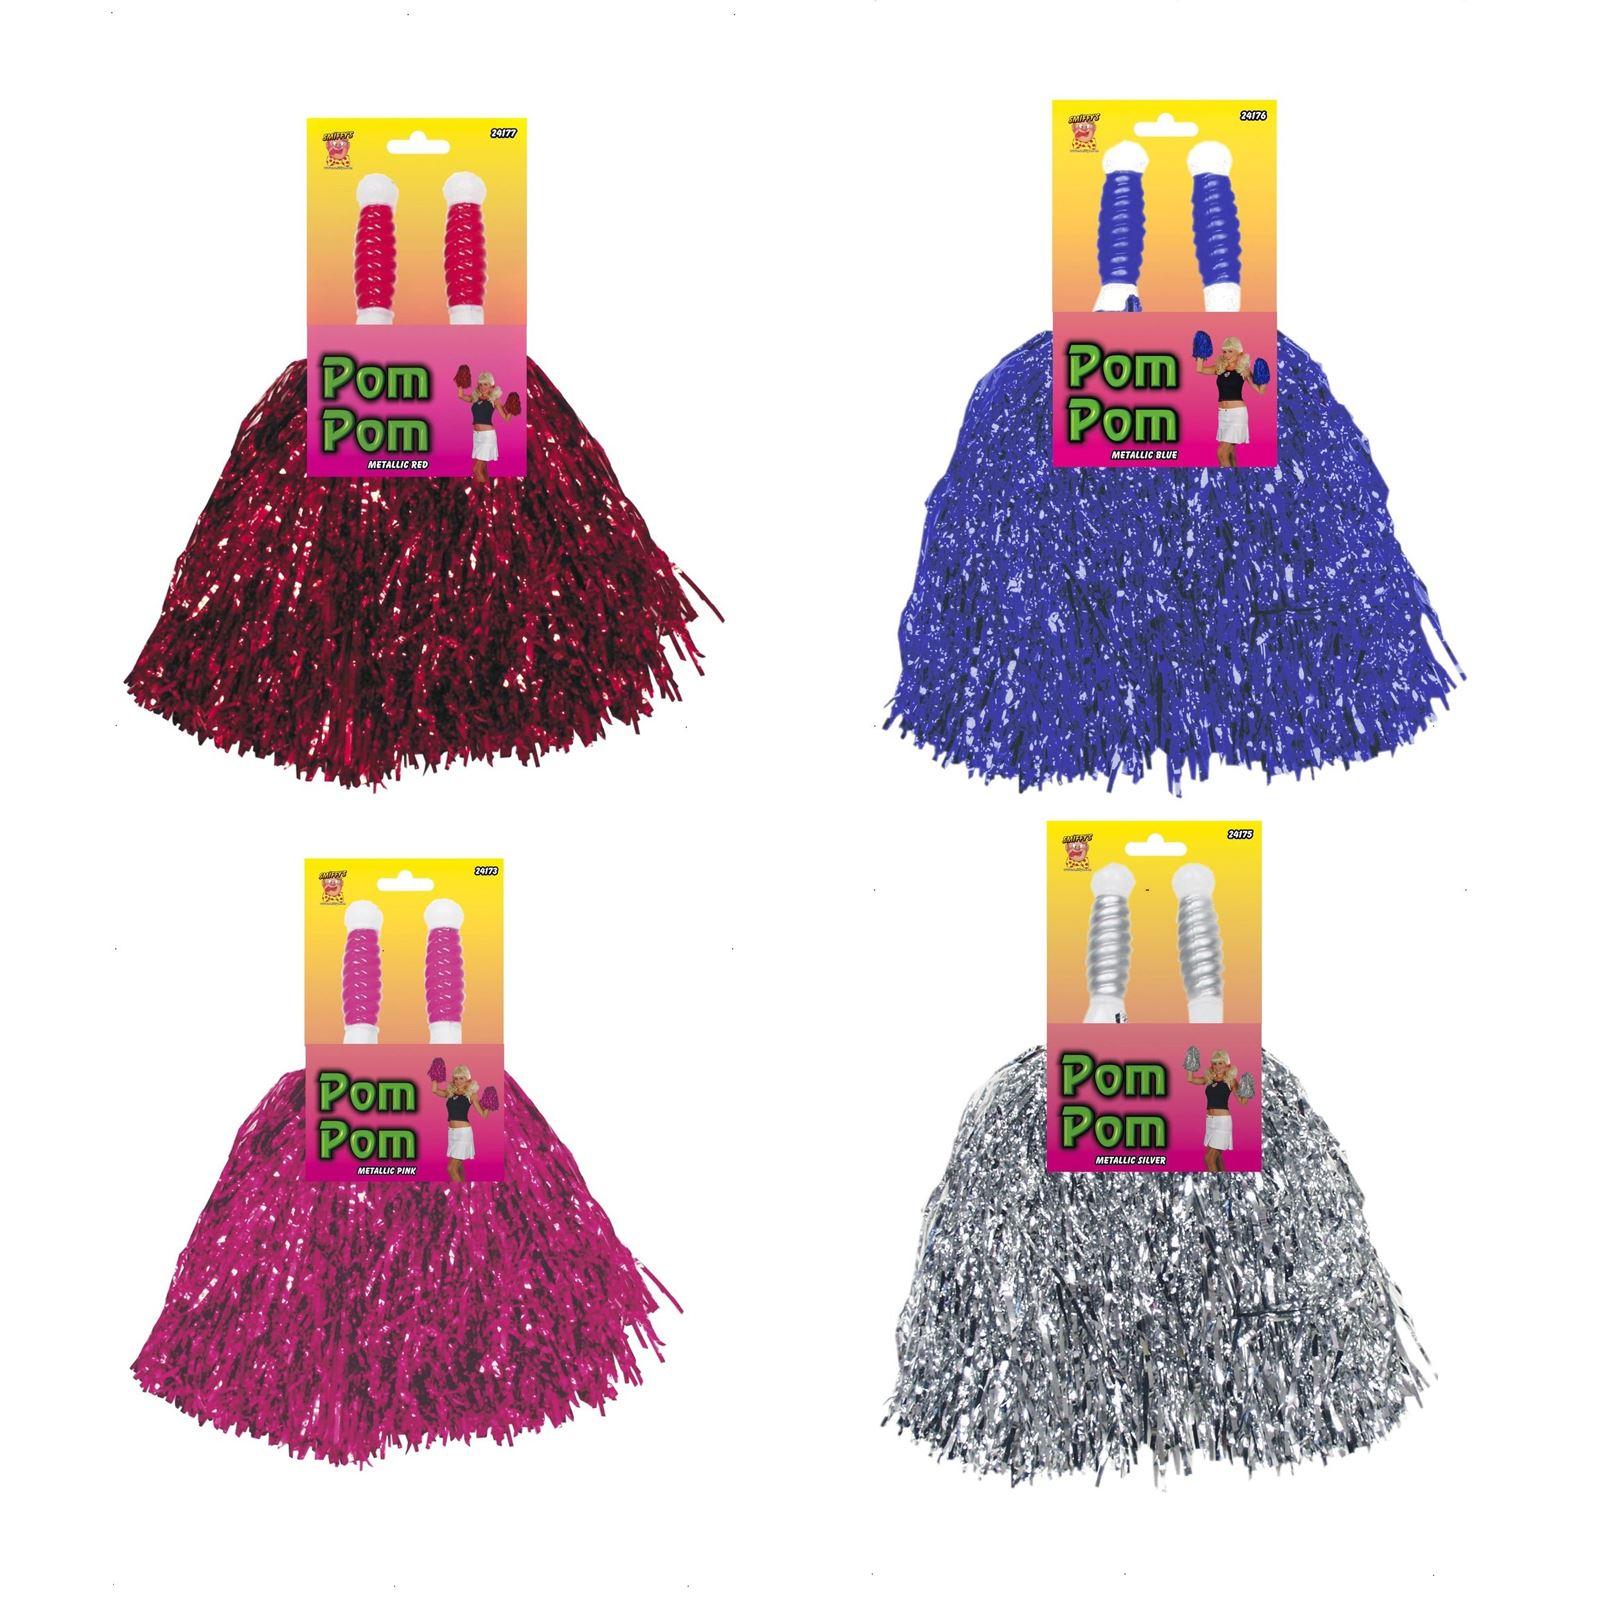 Pompoms Pom Poms Cheerleader Dance Wear Hen Party Fancy Dress Pack of 5 Pairs